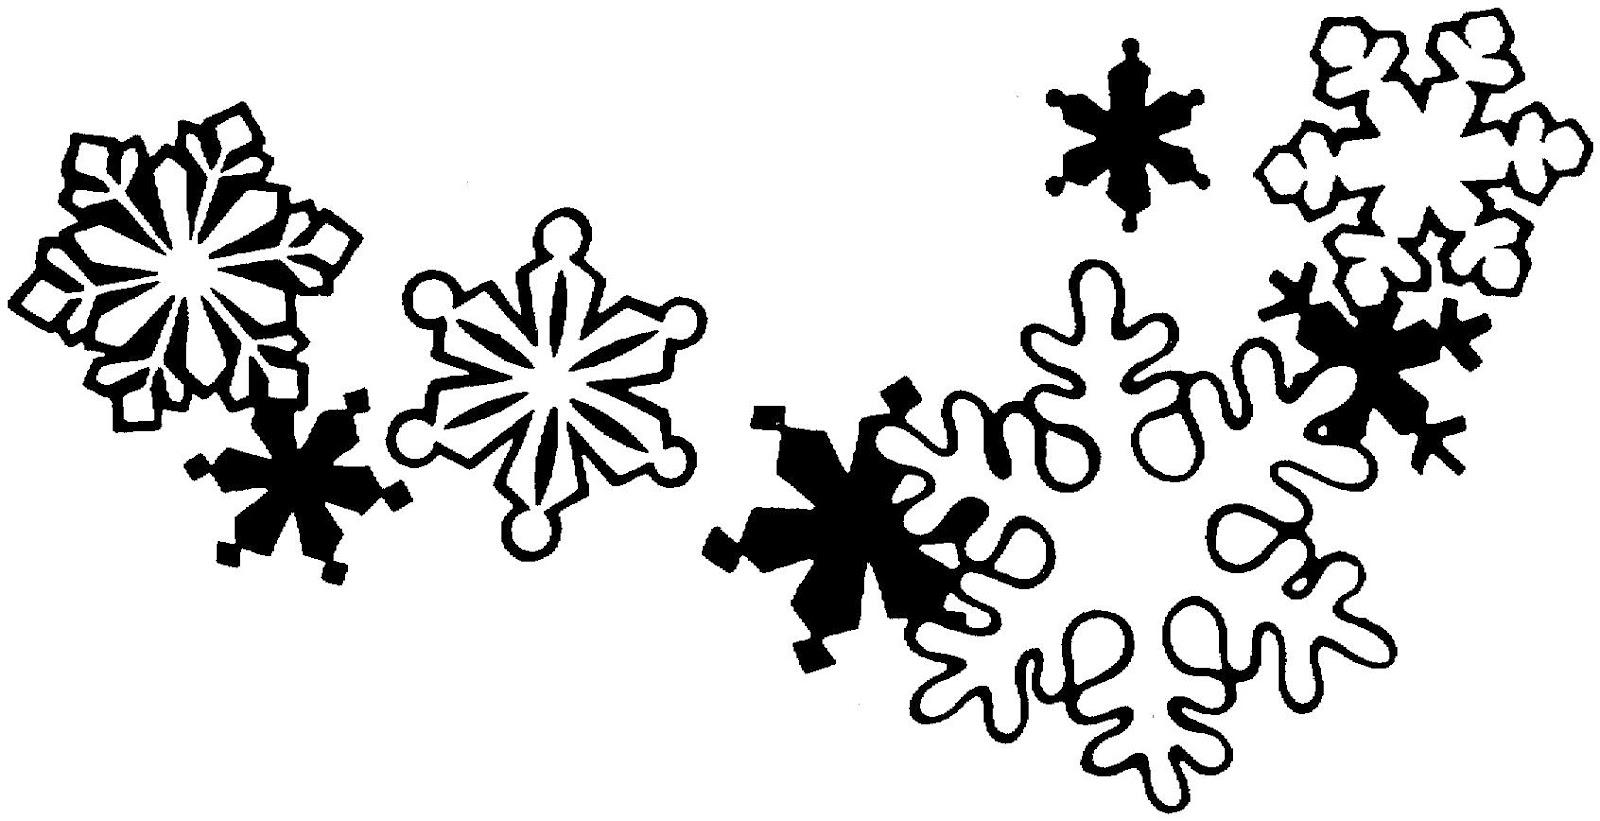 Free Snow Cliparts Black Download Free Clip Art Free